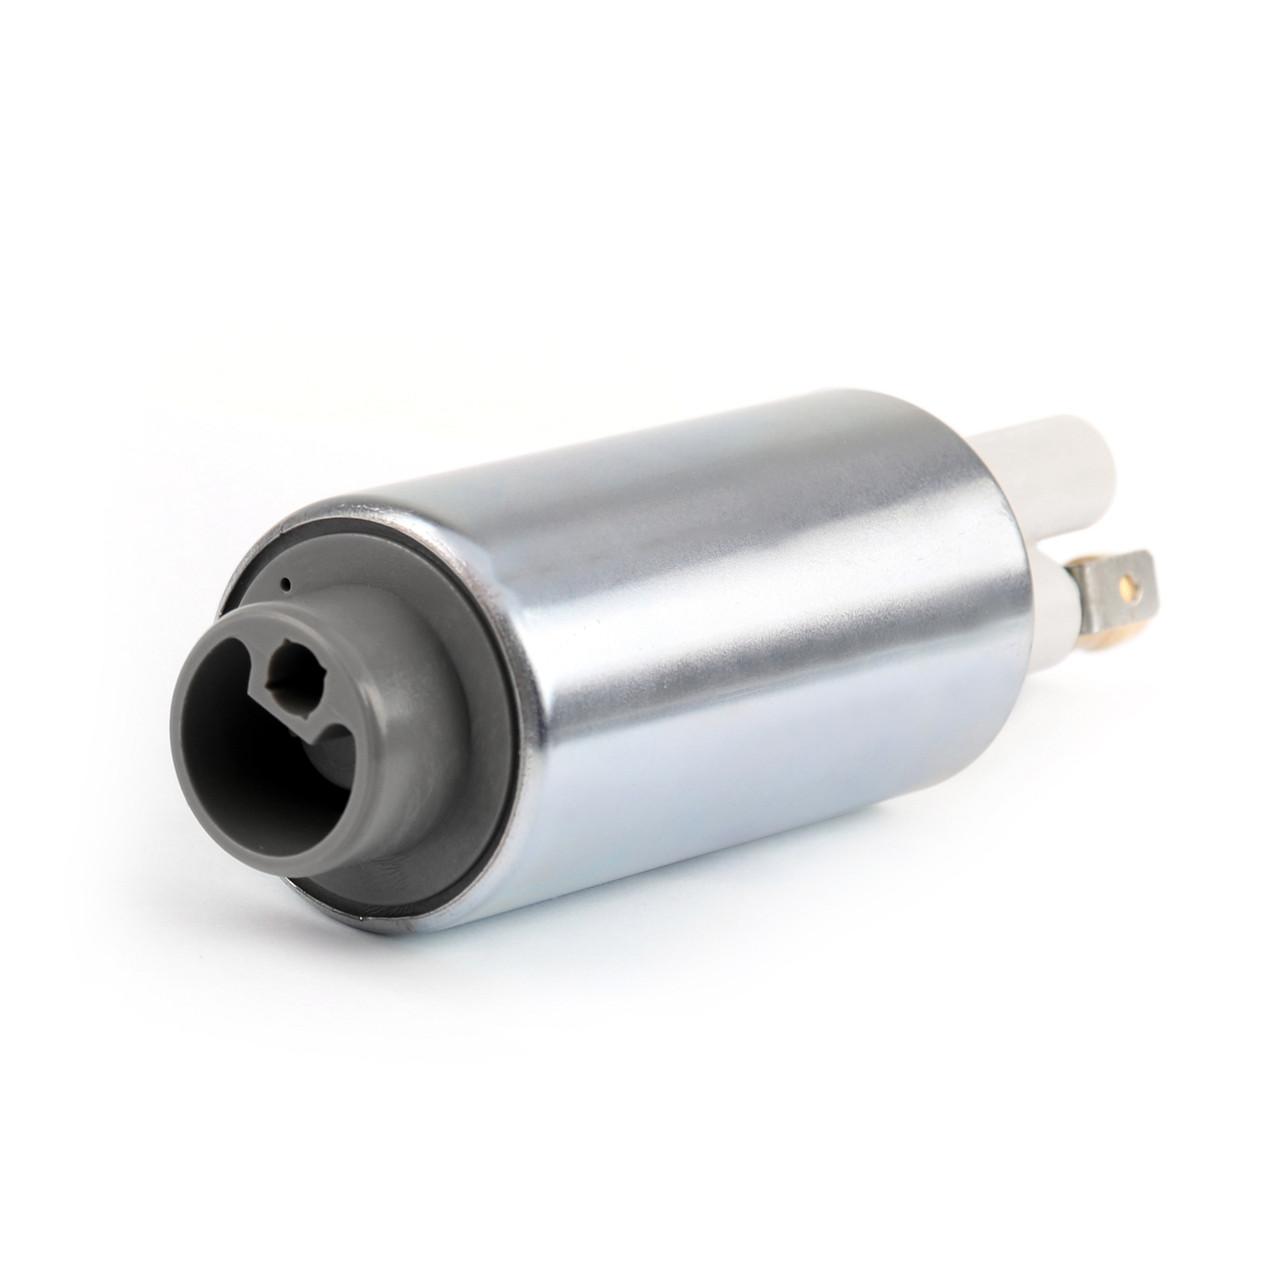 Fuel Pump For BMW K75 84-96 R1100RT 82-91 K1100 83-89 LT K1100 89-92 Silver